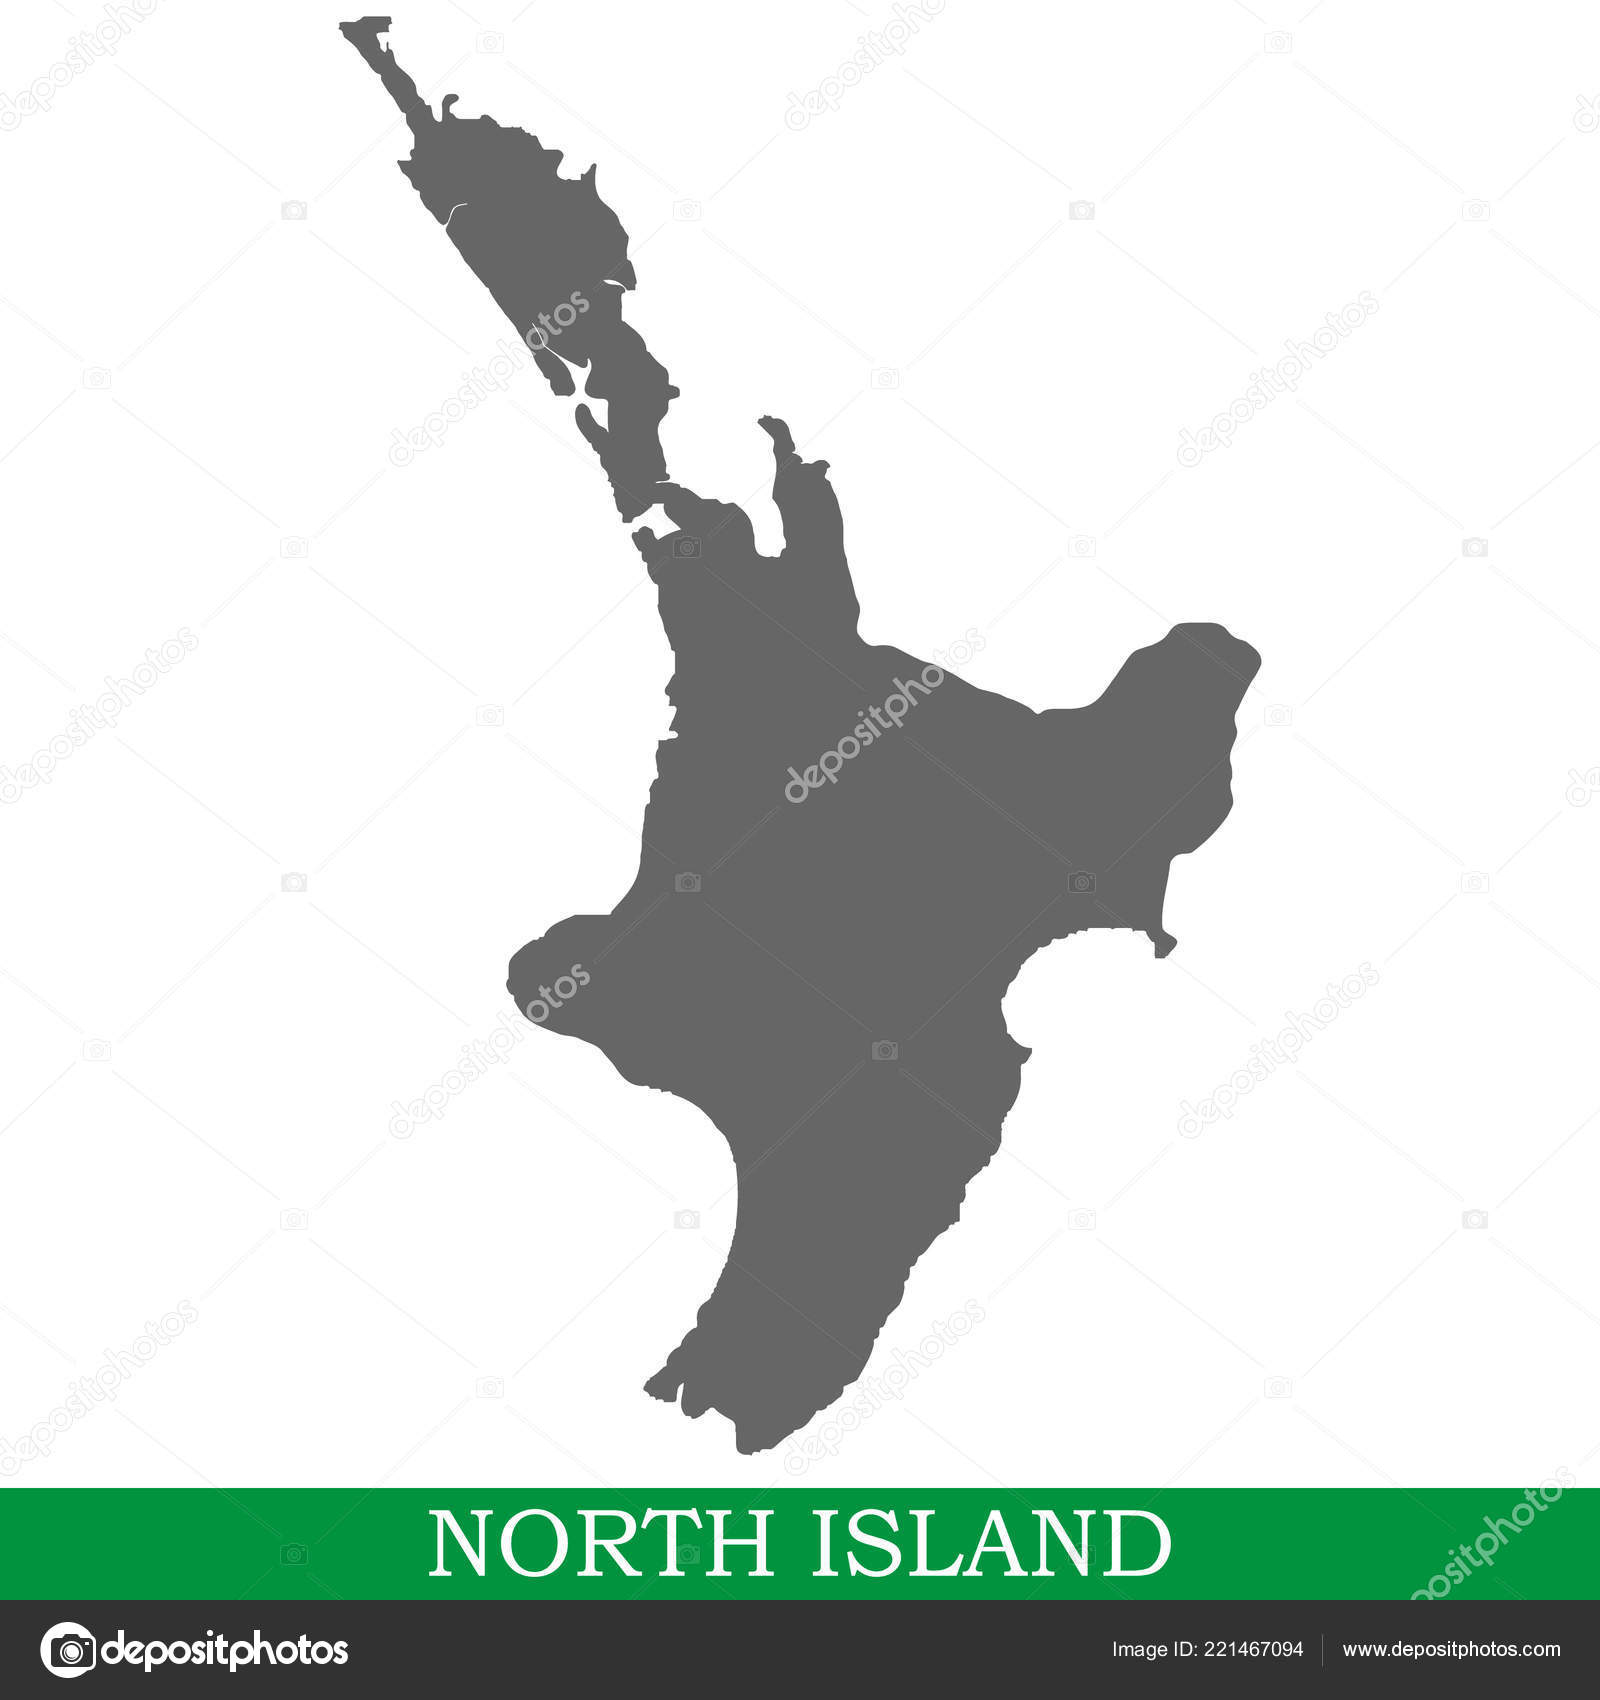 Neuseeland Nordinsel Karte.Hochwertige Karte Der Nordinsel Ist Die Nordinsel Von Neuseeland